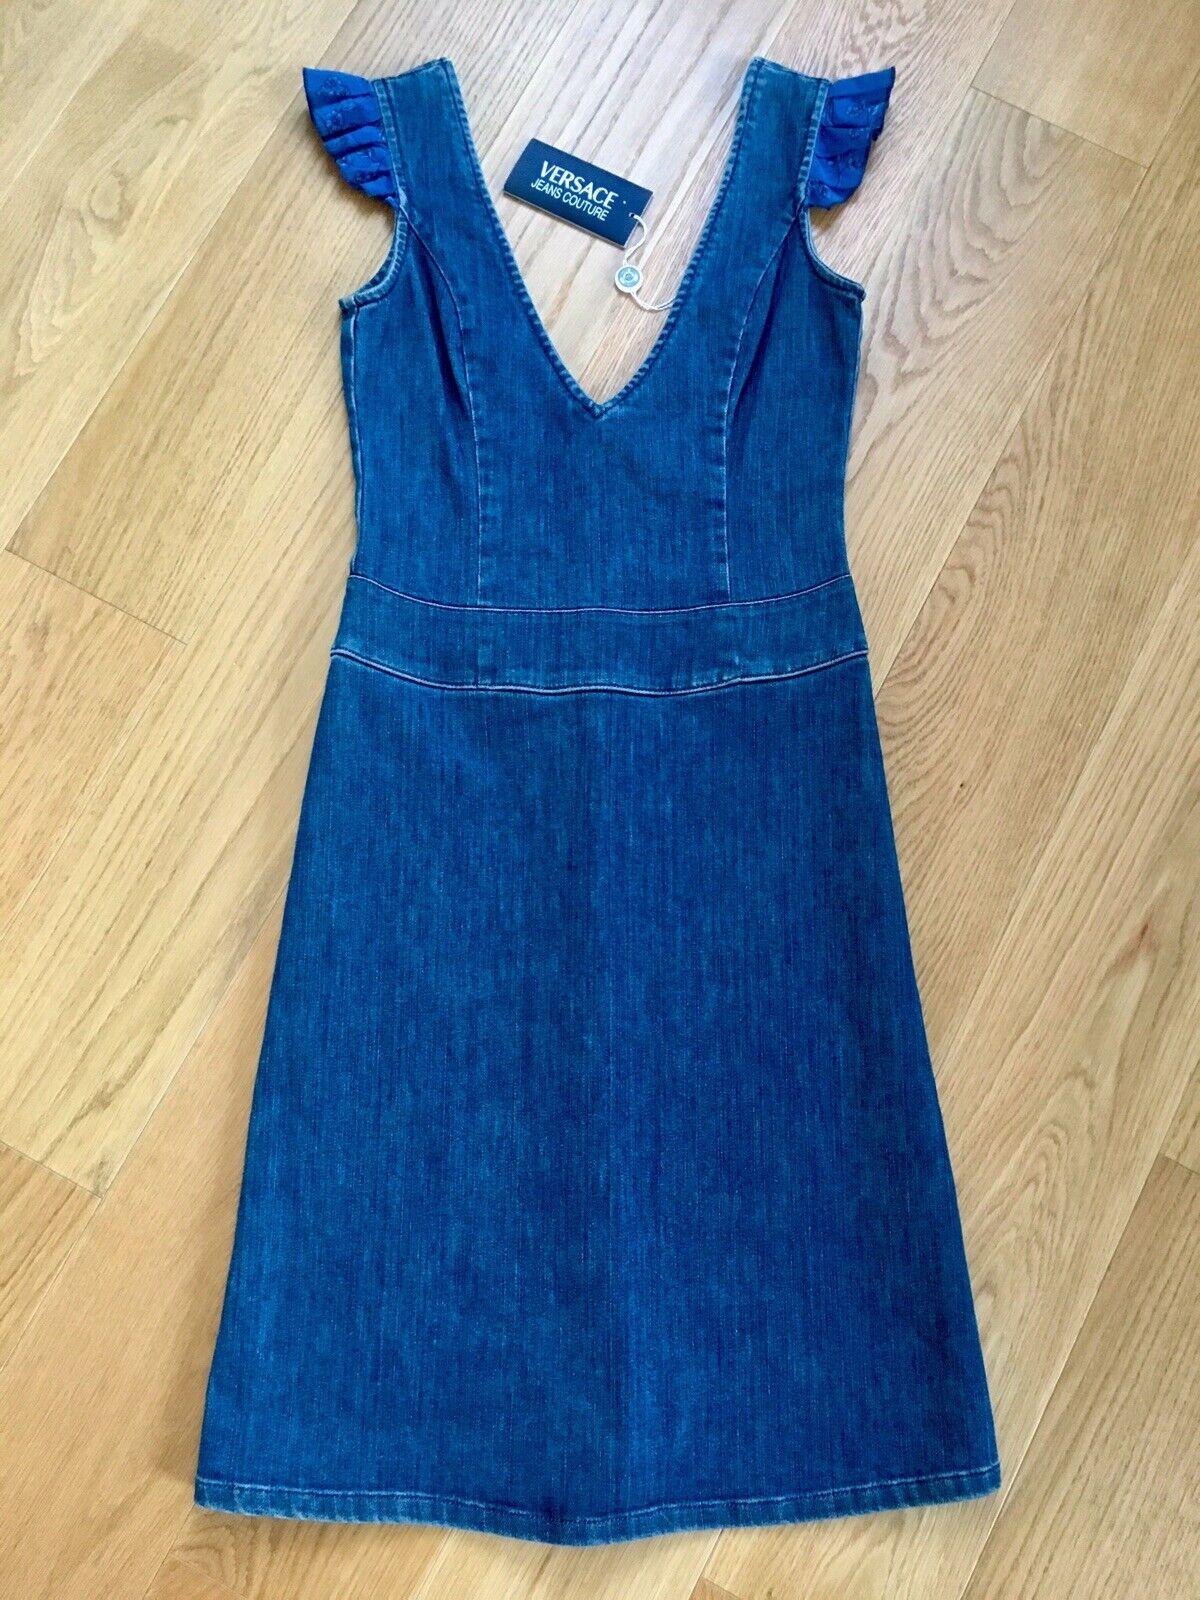 NEU Versace Jeanskleid Kleid stretch Gr. 36 S NP€195,-